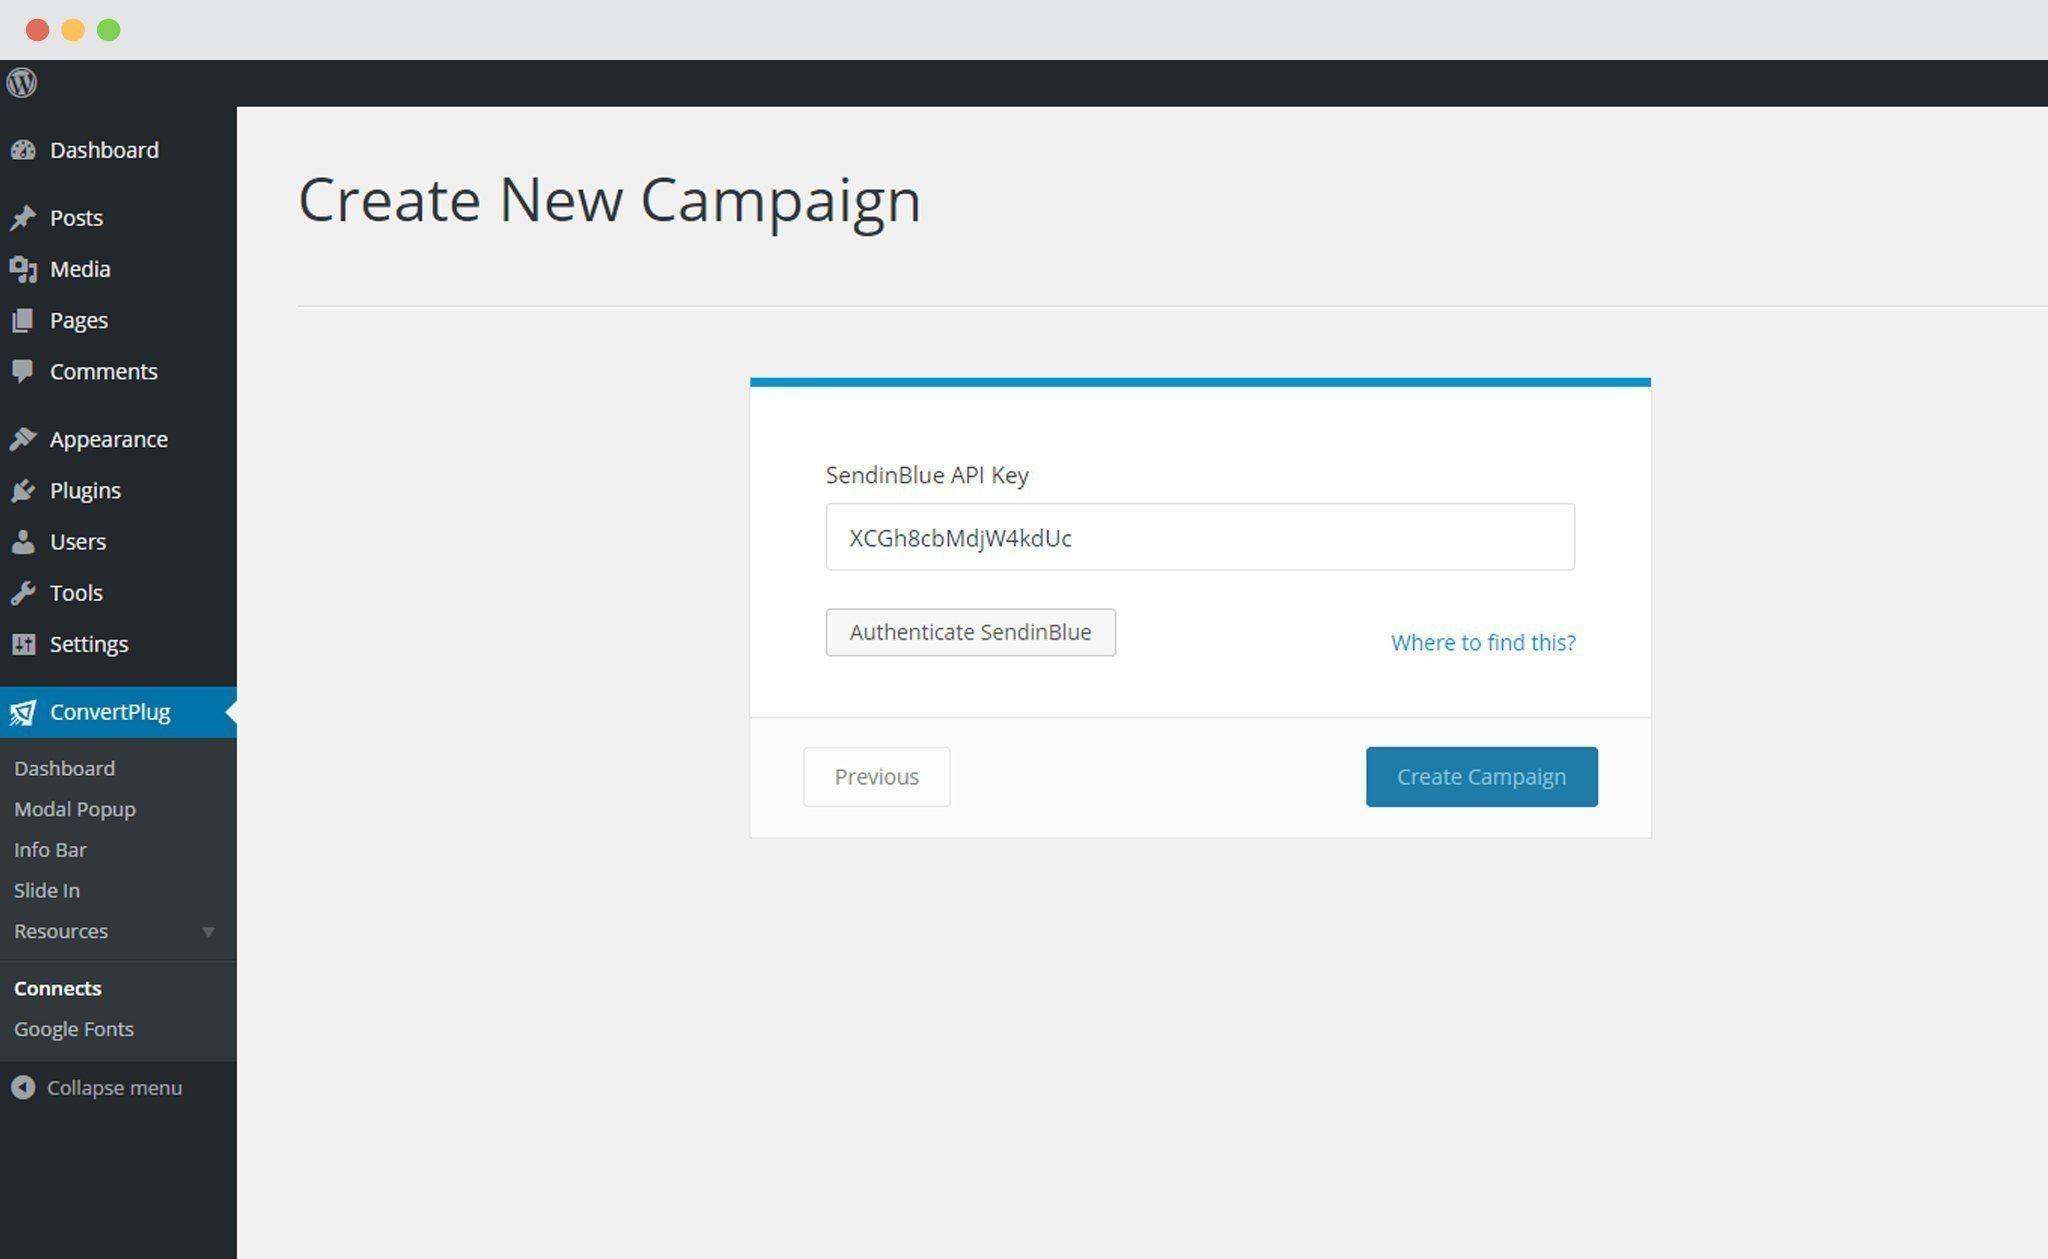 SendinBlue API Key pasted in ConvertPlug